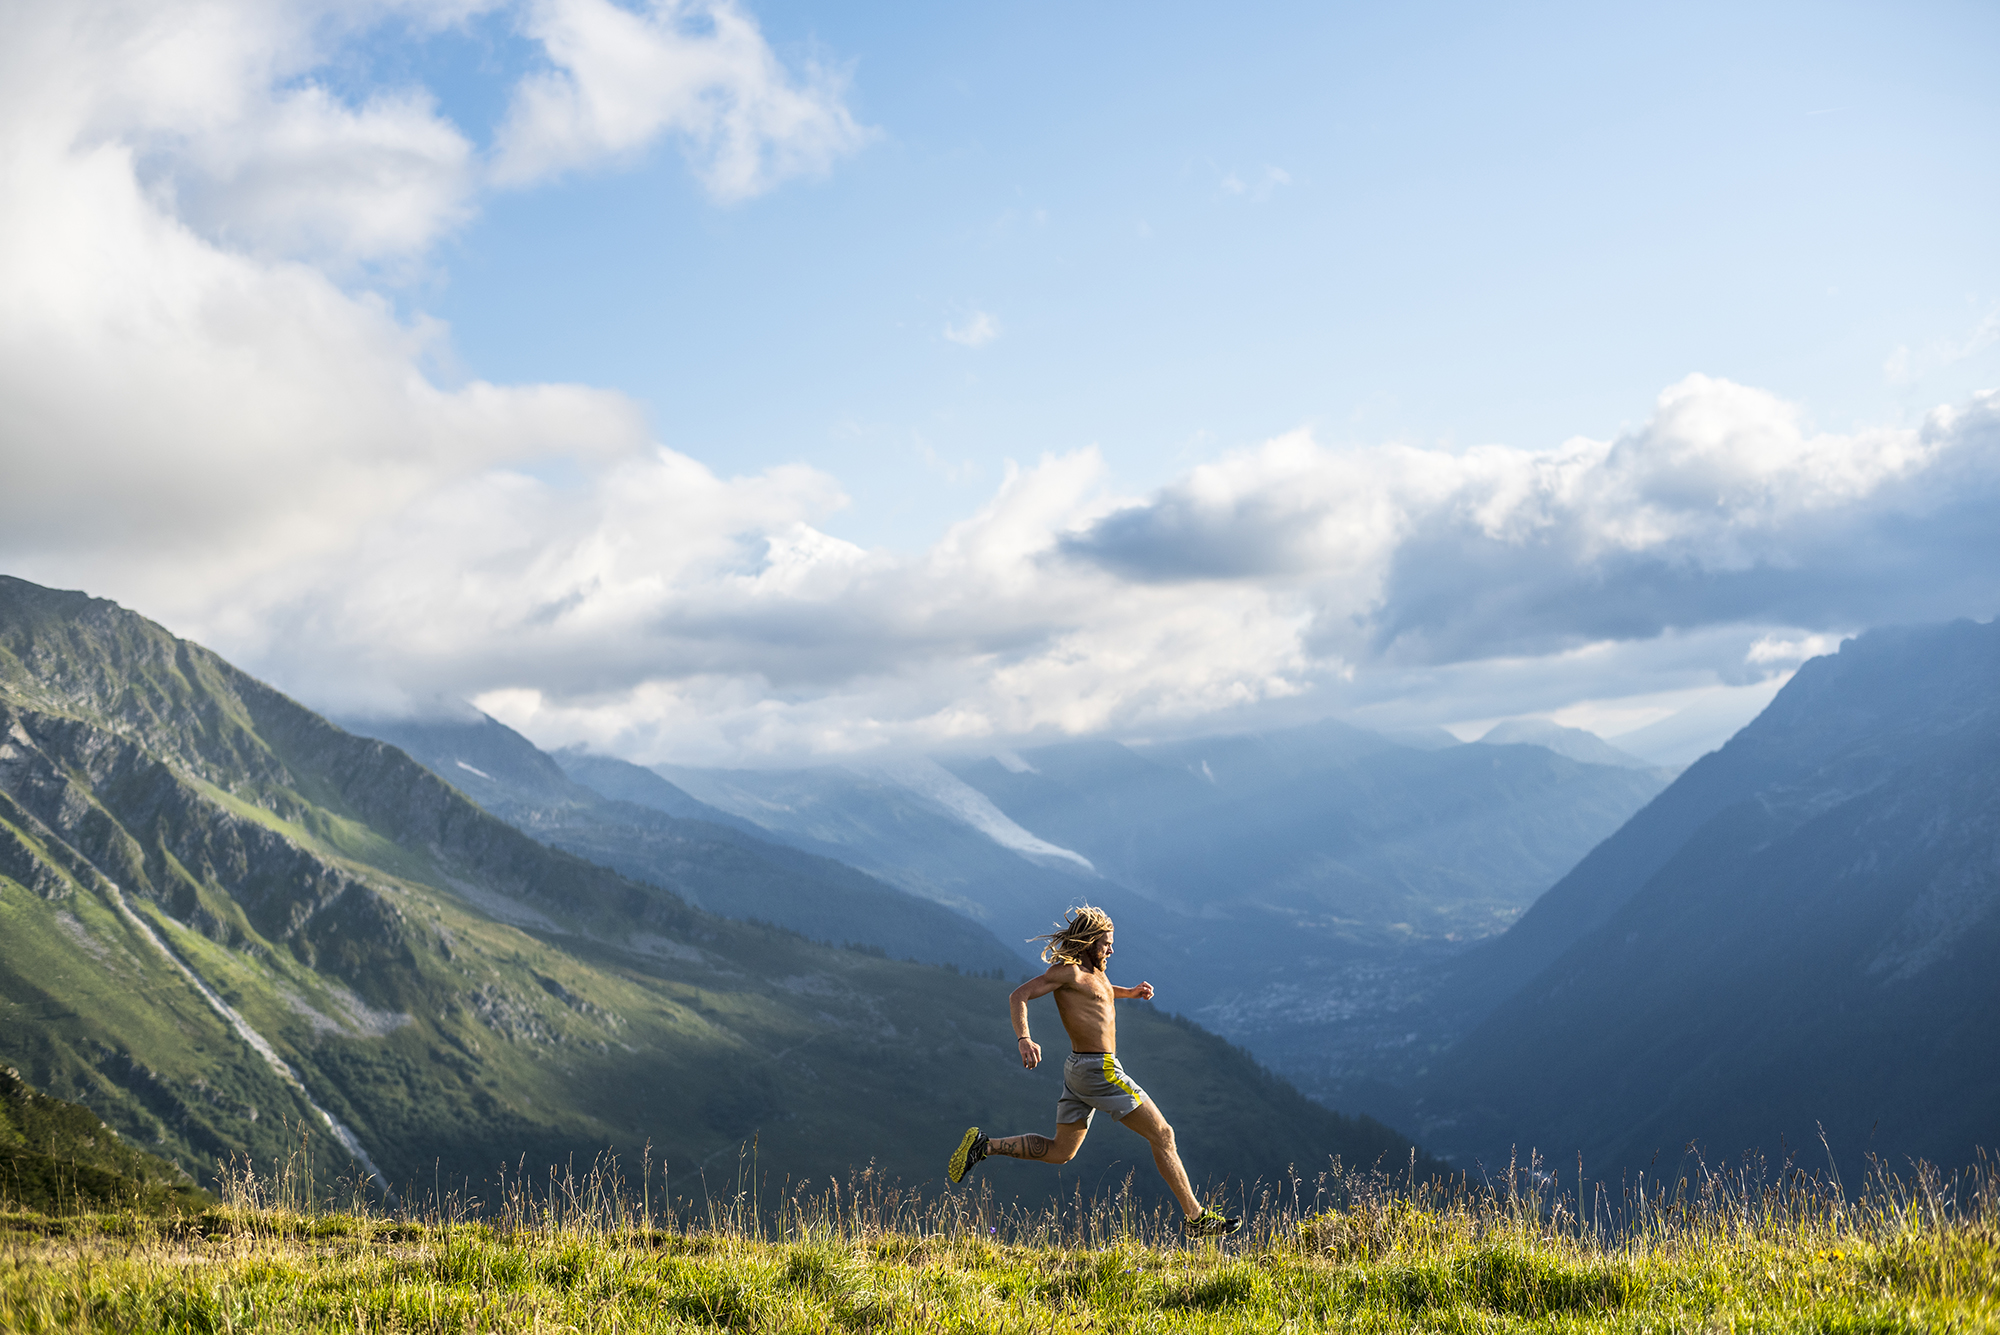 Tim Olson. Chamonix, France. Photography by Tim Kemple.